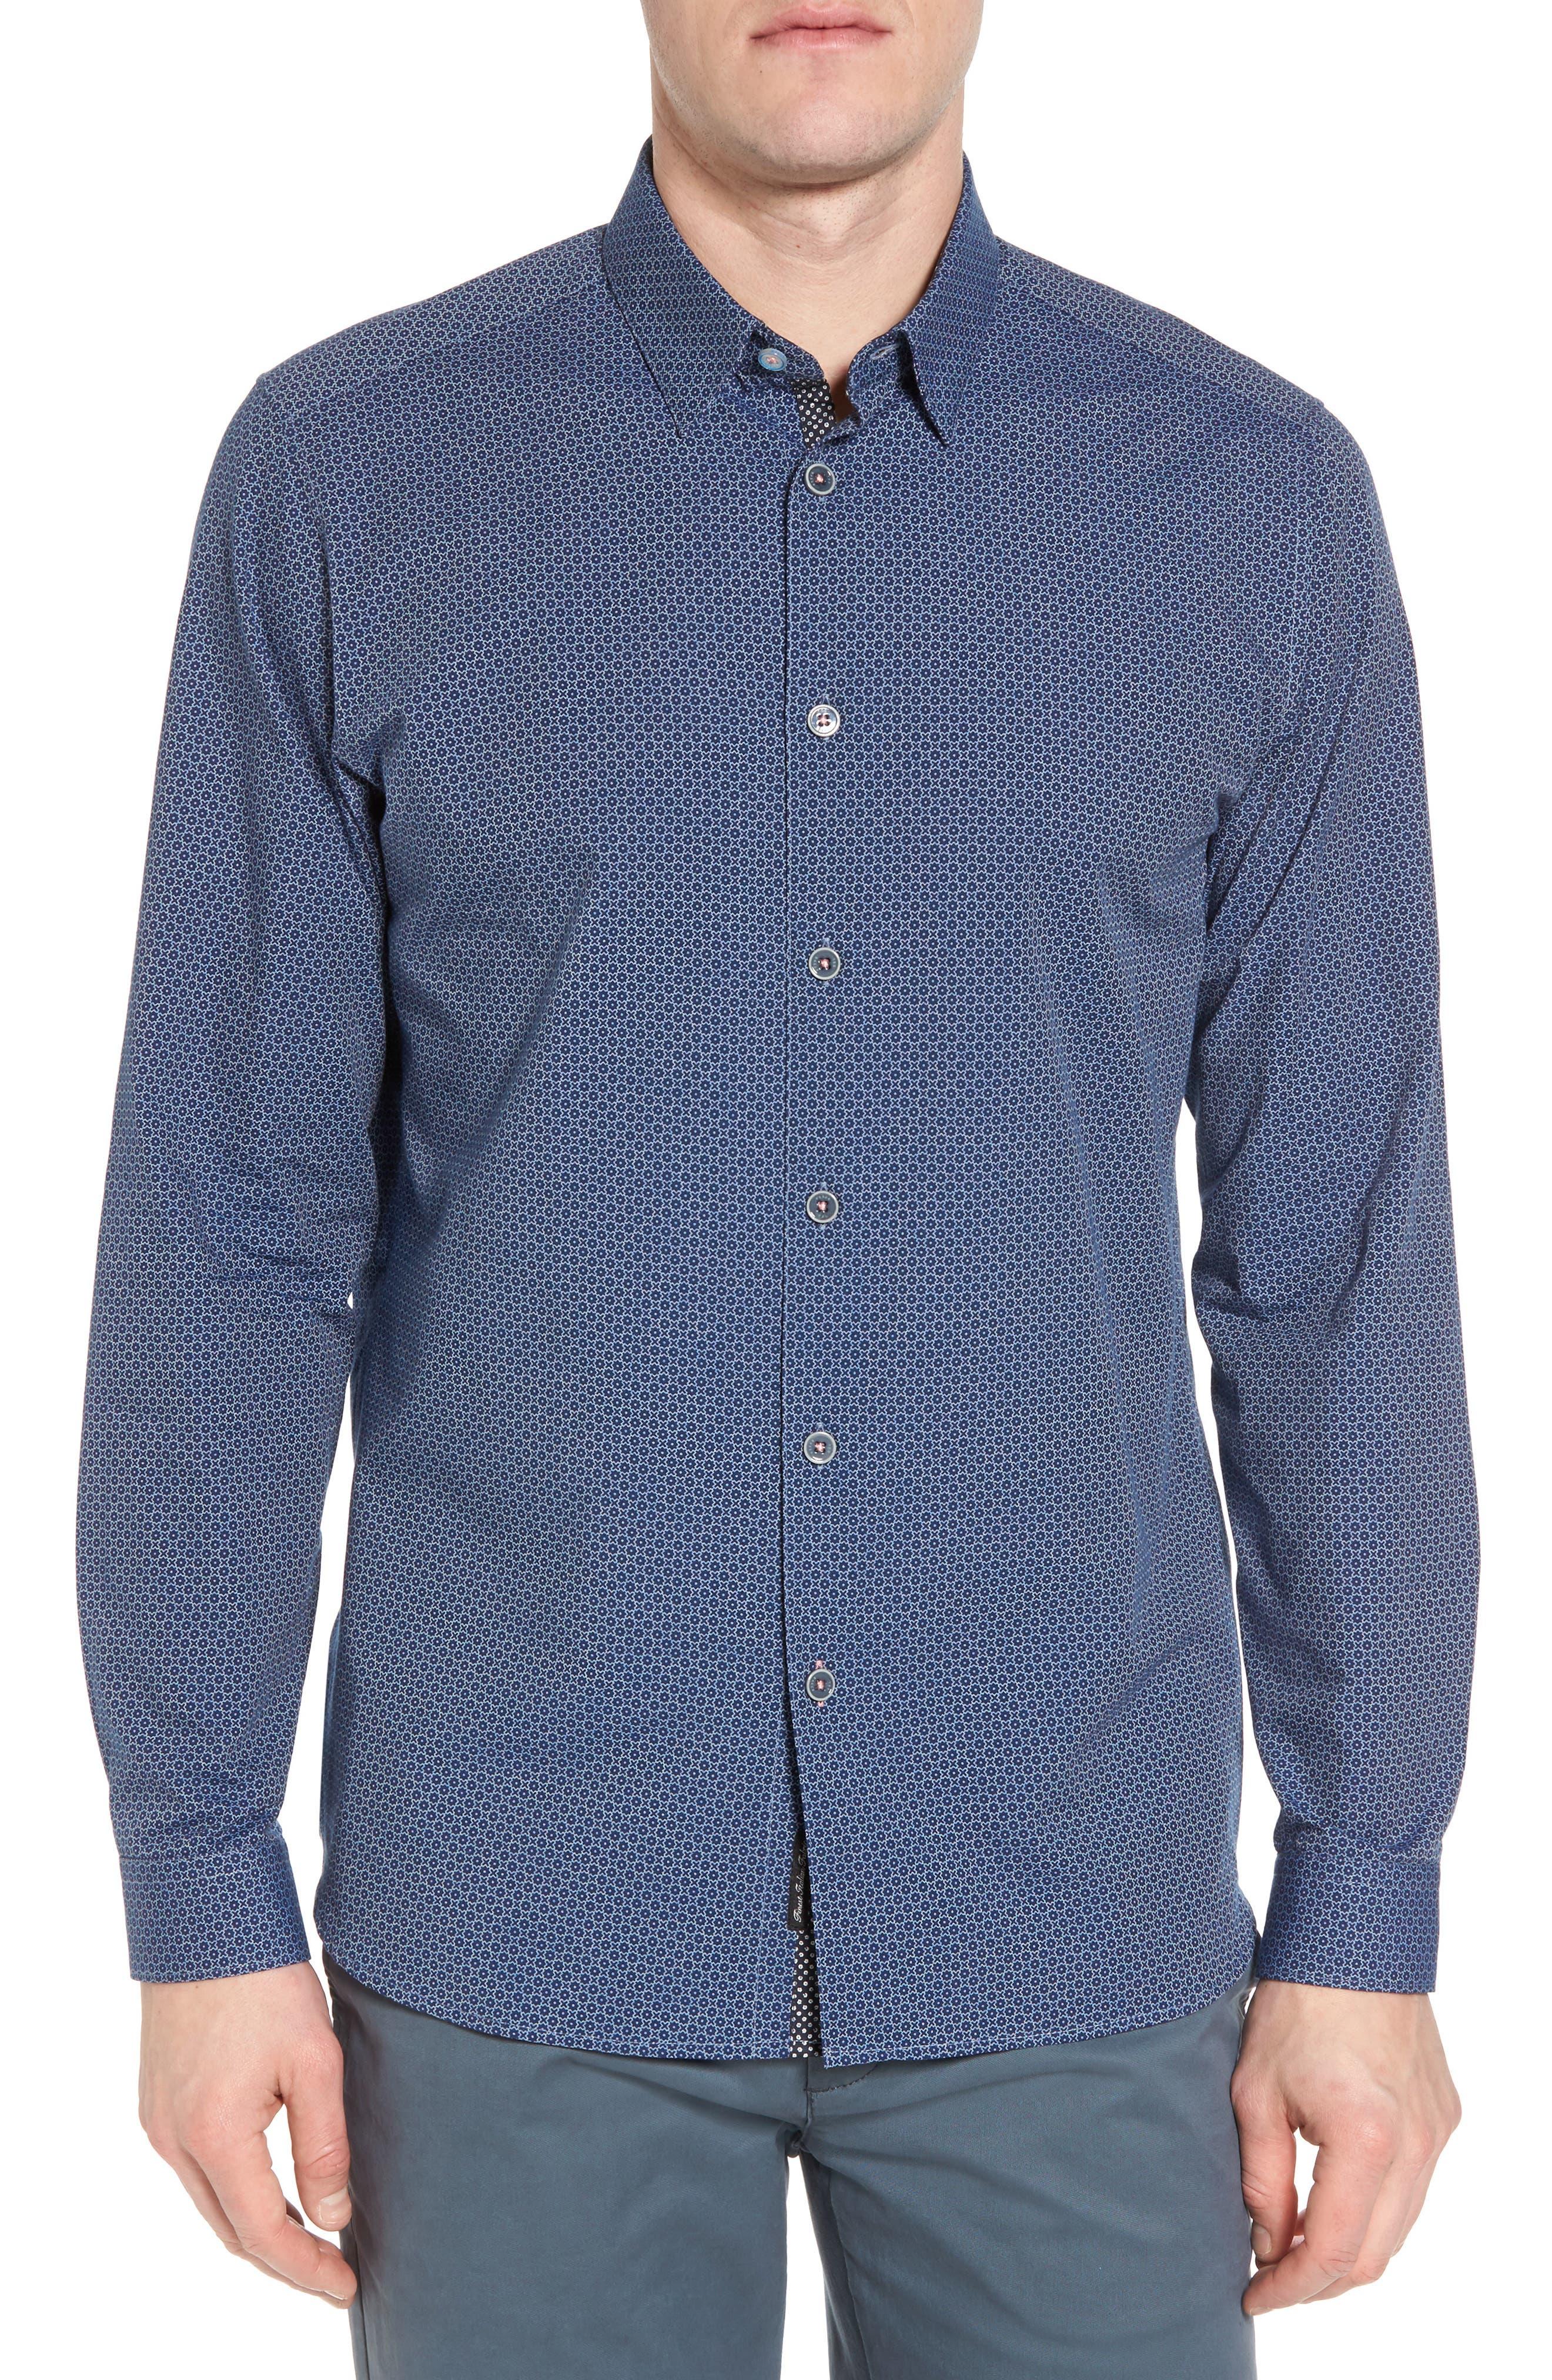 Holic Trim Fit Geometric Sport Shirt,                         Main,                         color, 421